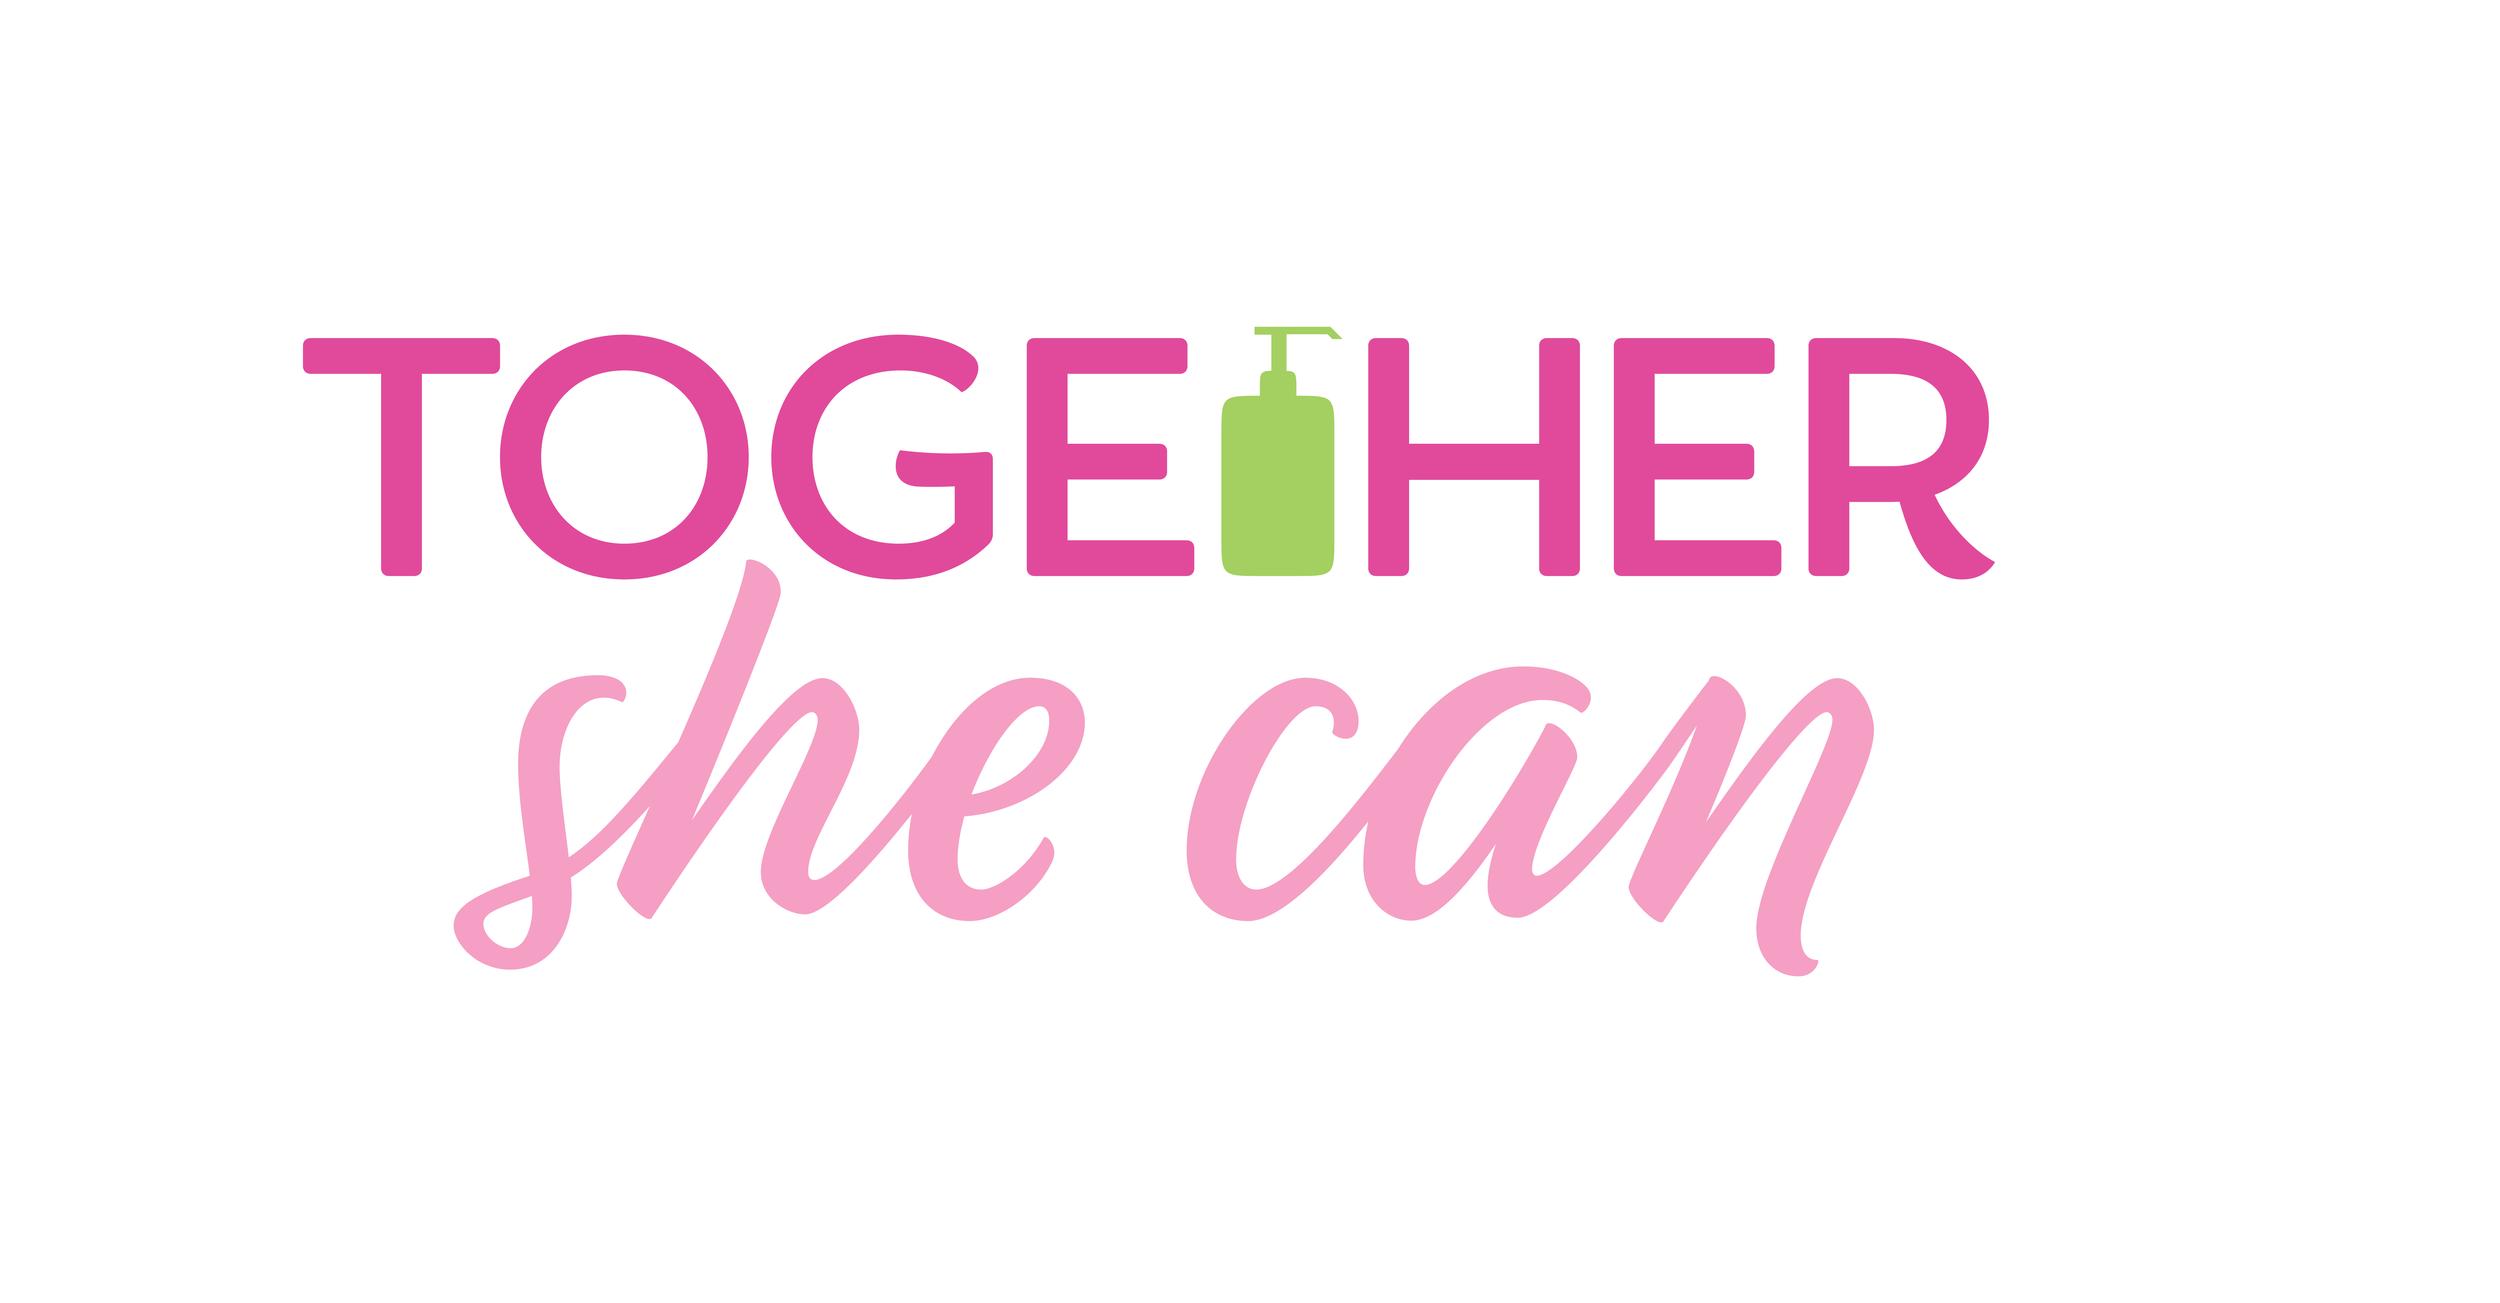 togethershecan-logo-stacked-02.png